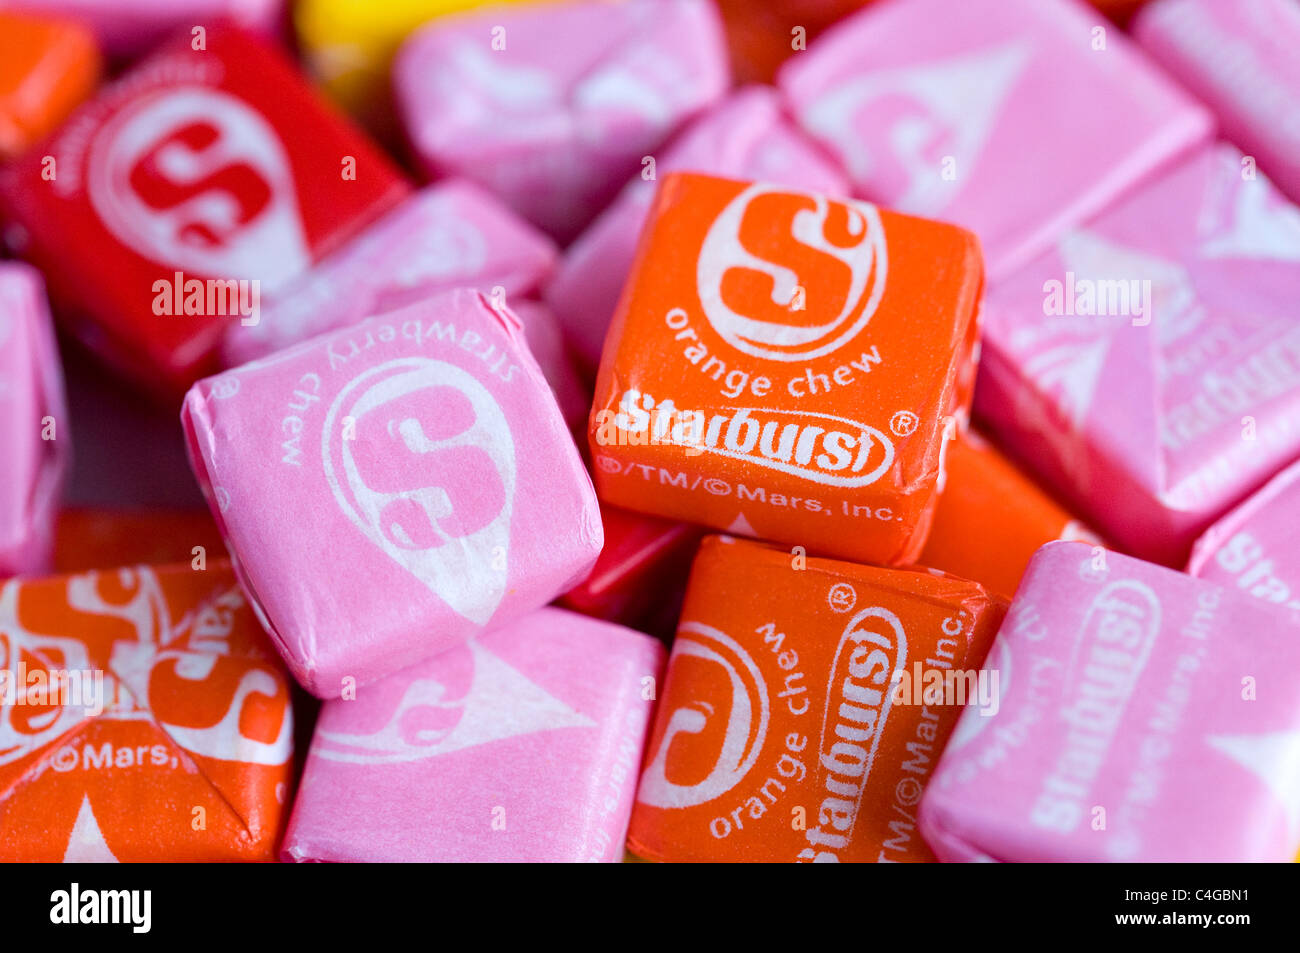 Starburst fruit candy.  - Stock Image